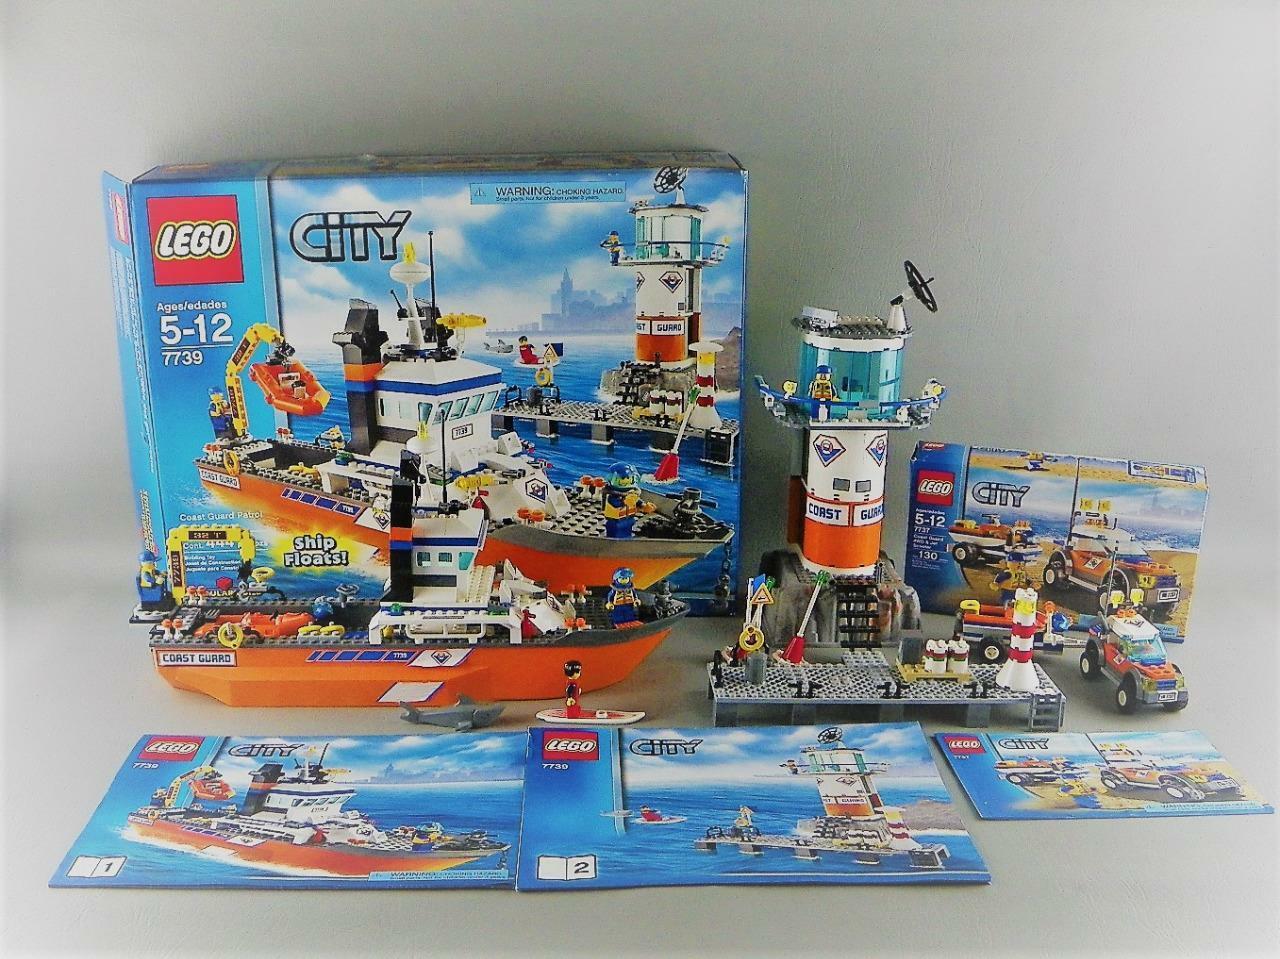 LEGO City Coast Coast Coast Guard Patrol Boat 7739   7737 100% Complete w  Box + Manuals Lot 6c4b0e